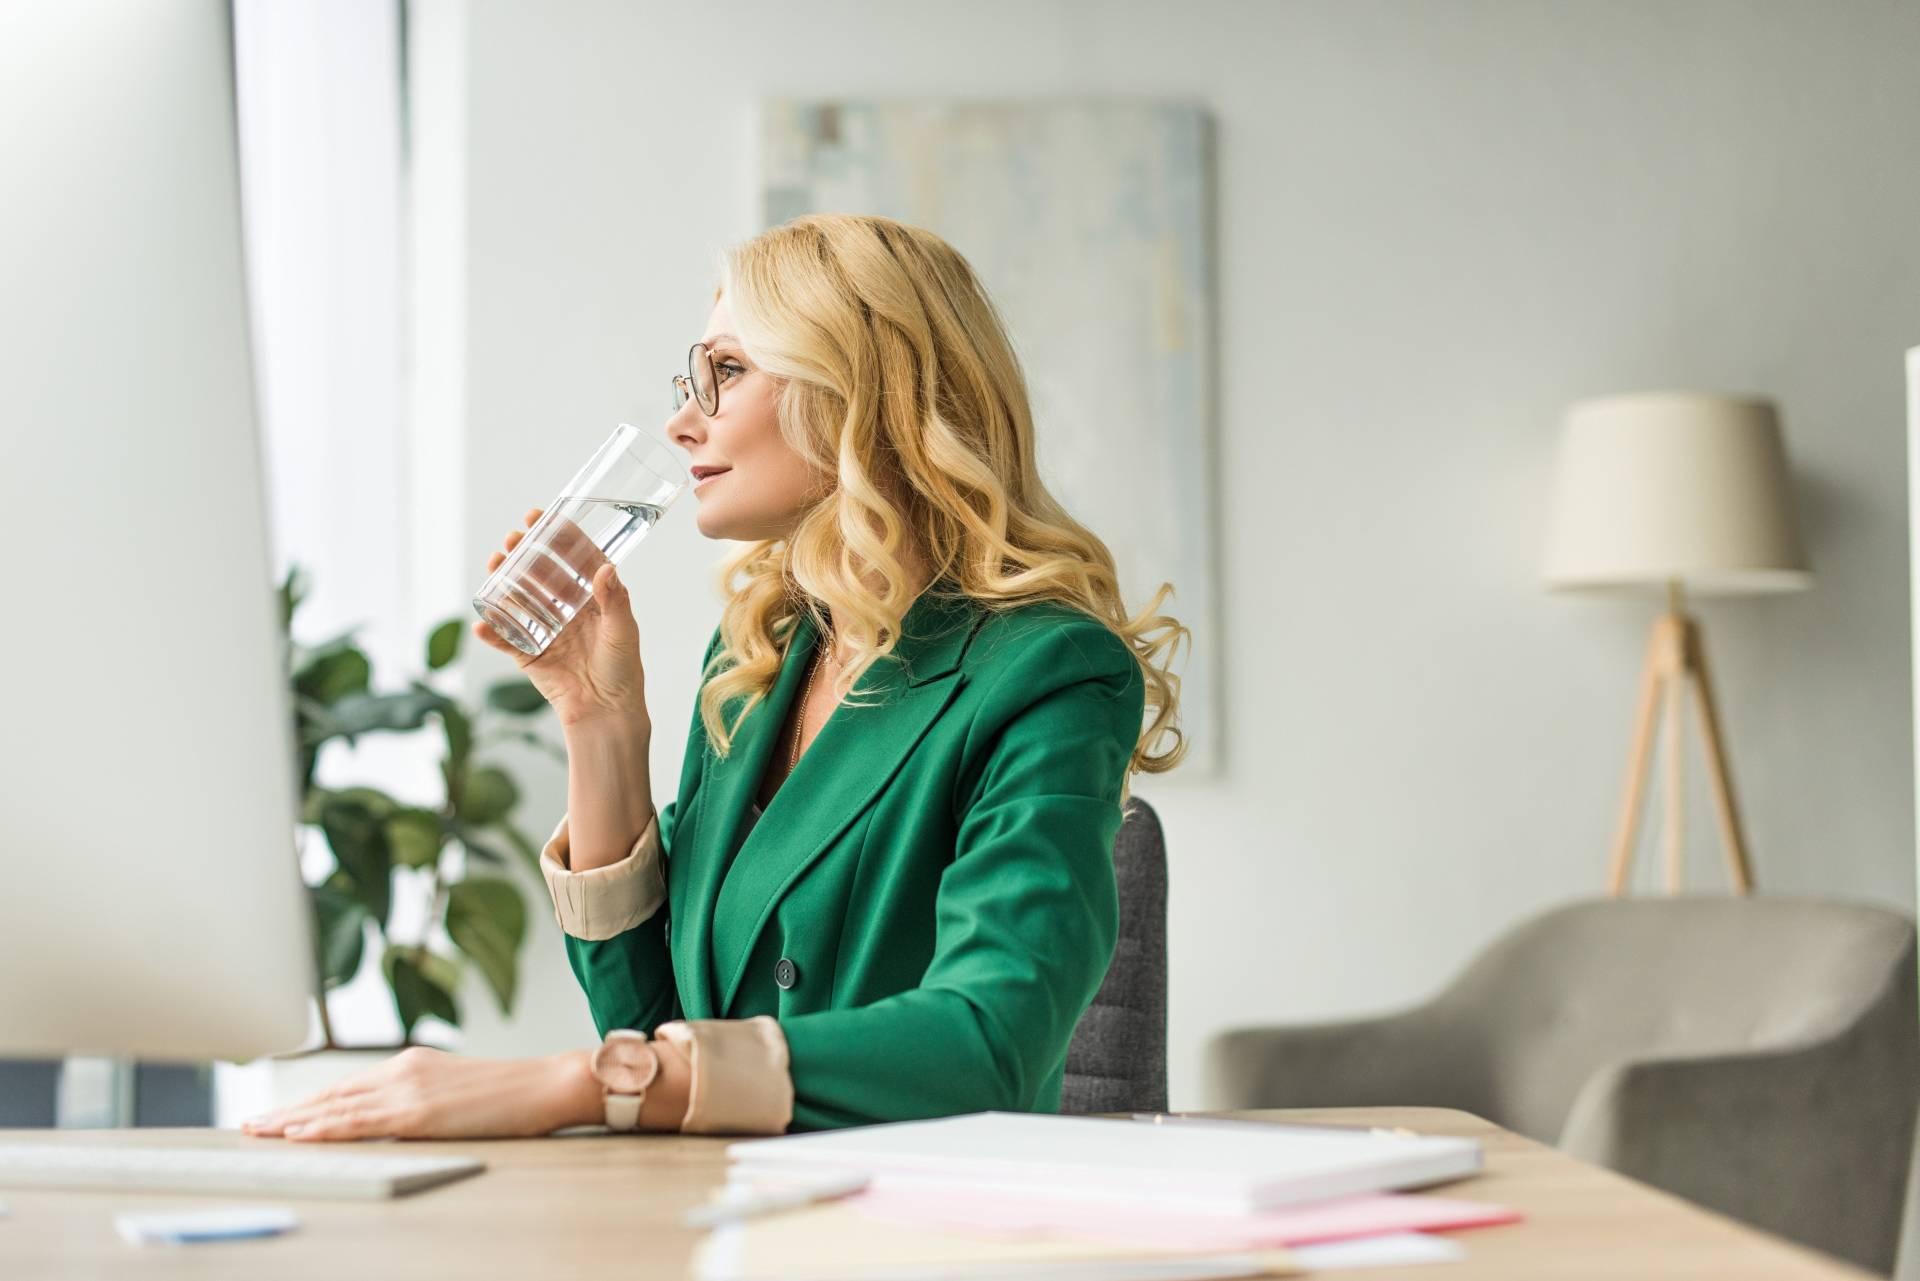 Dieta na stres - picie wody nawadnia organizm.